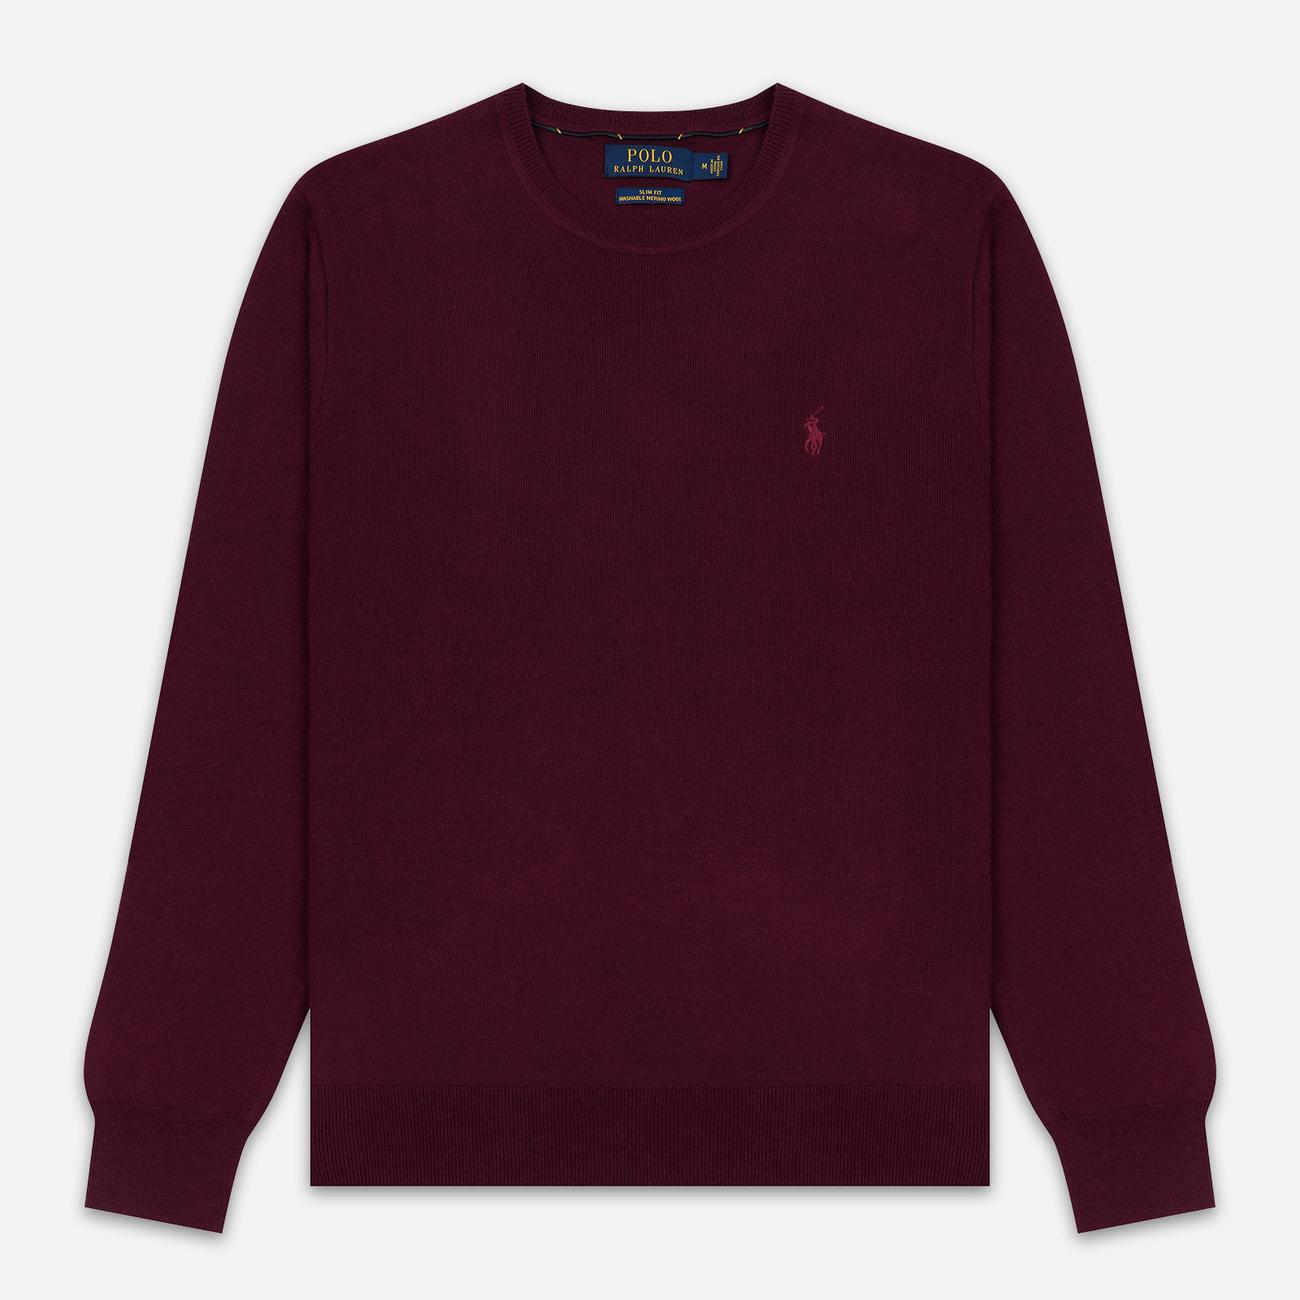 Мужской свитер Polo Ralph Lauren Classic Crew Neck Merino Wool Classic Burgundy